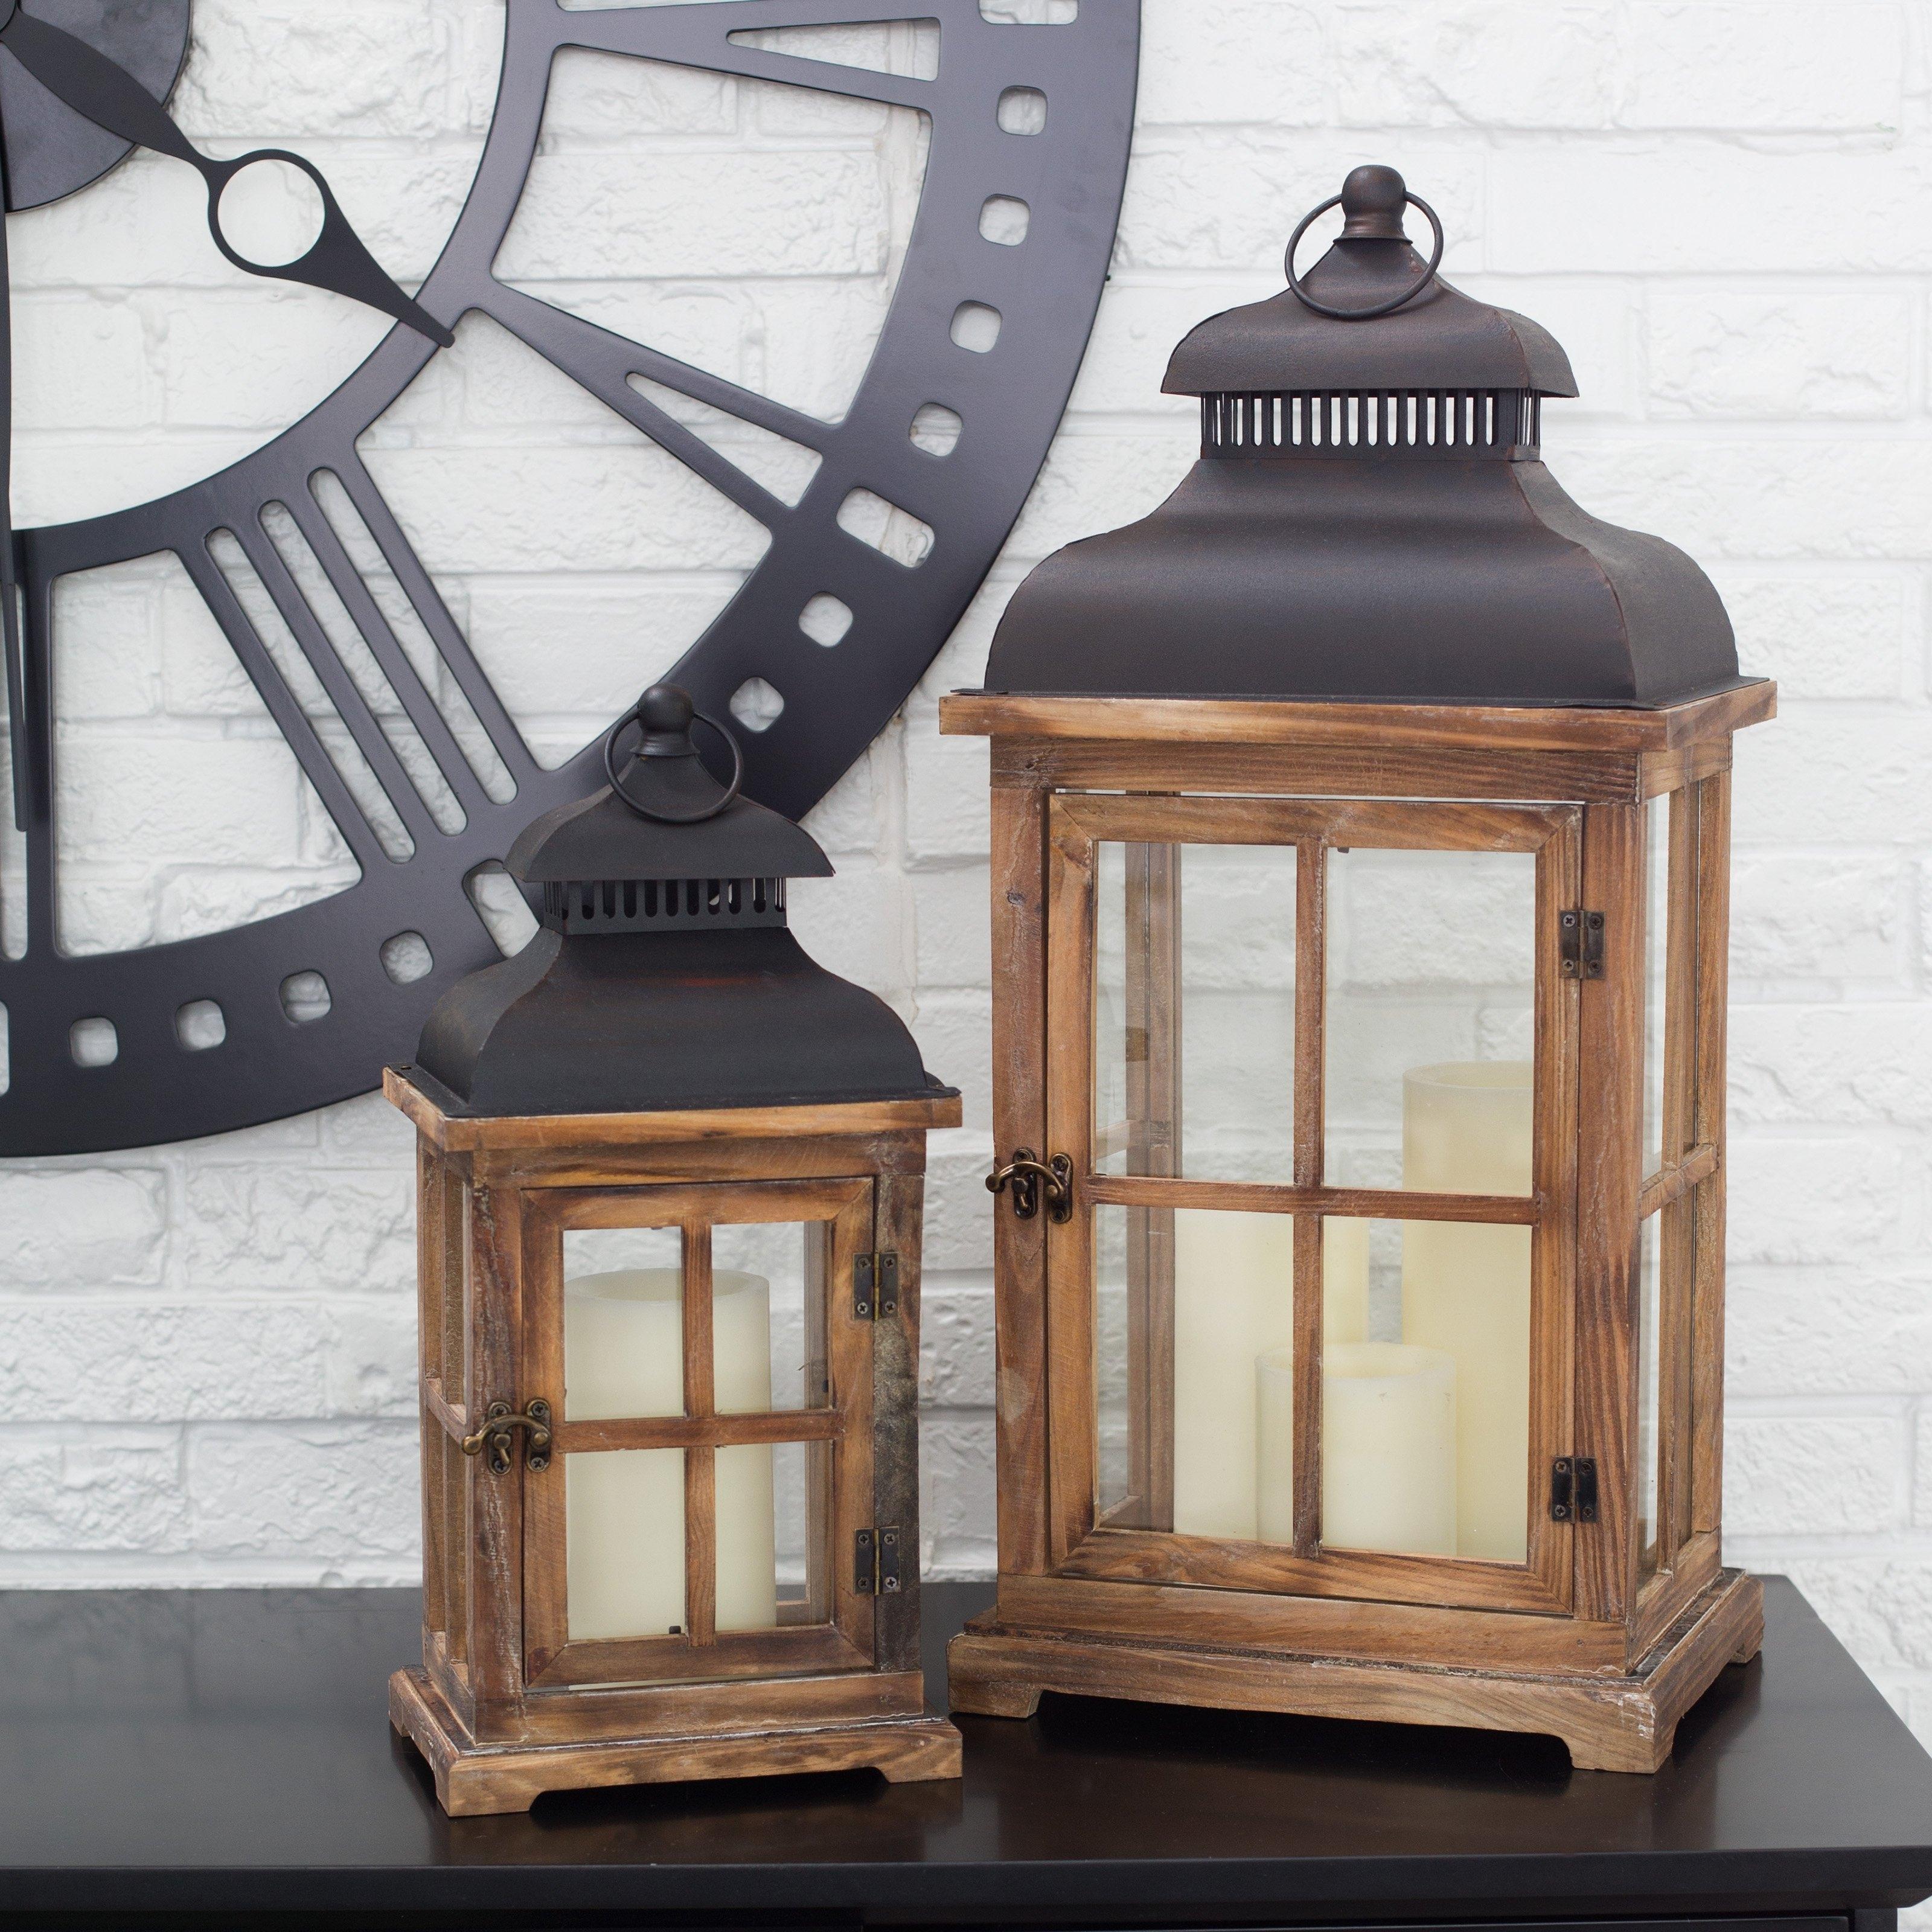 Large Outdoor Decorative Lanterns – Outdoor Ideas Regarding Most Popular Large Outdoor Rustic Lanterns (View 11 of 20)